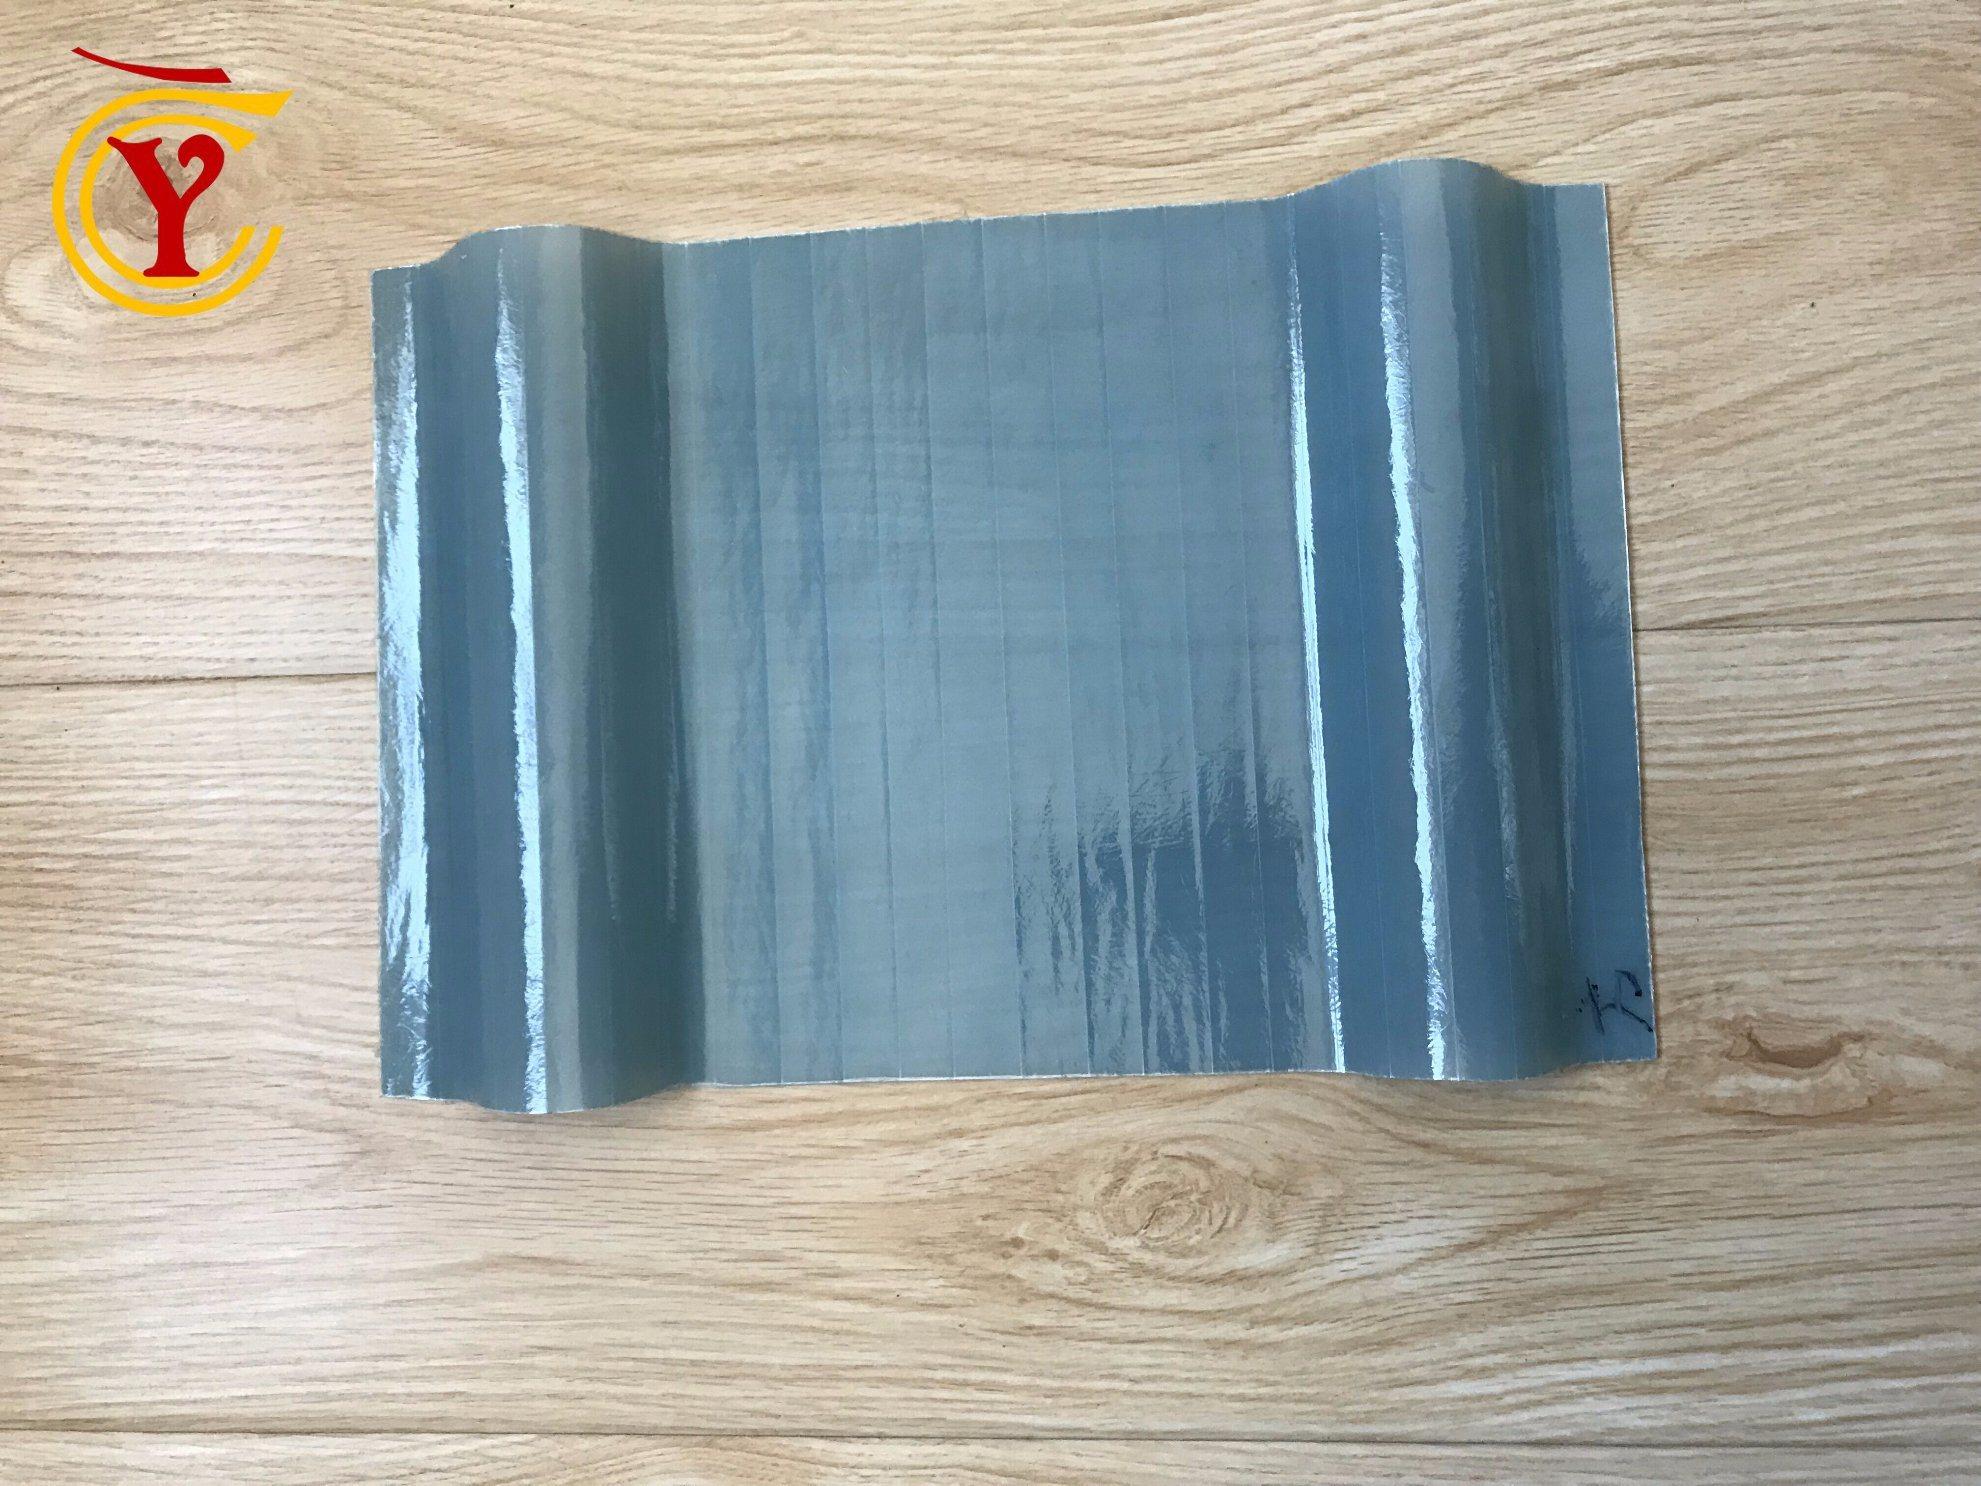 China Glass Fiber Reinforced Plastic FRP Skylight Sheet Photos